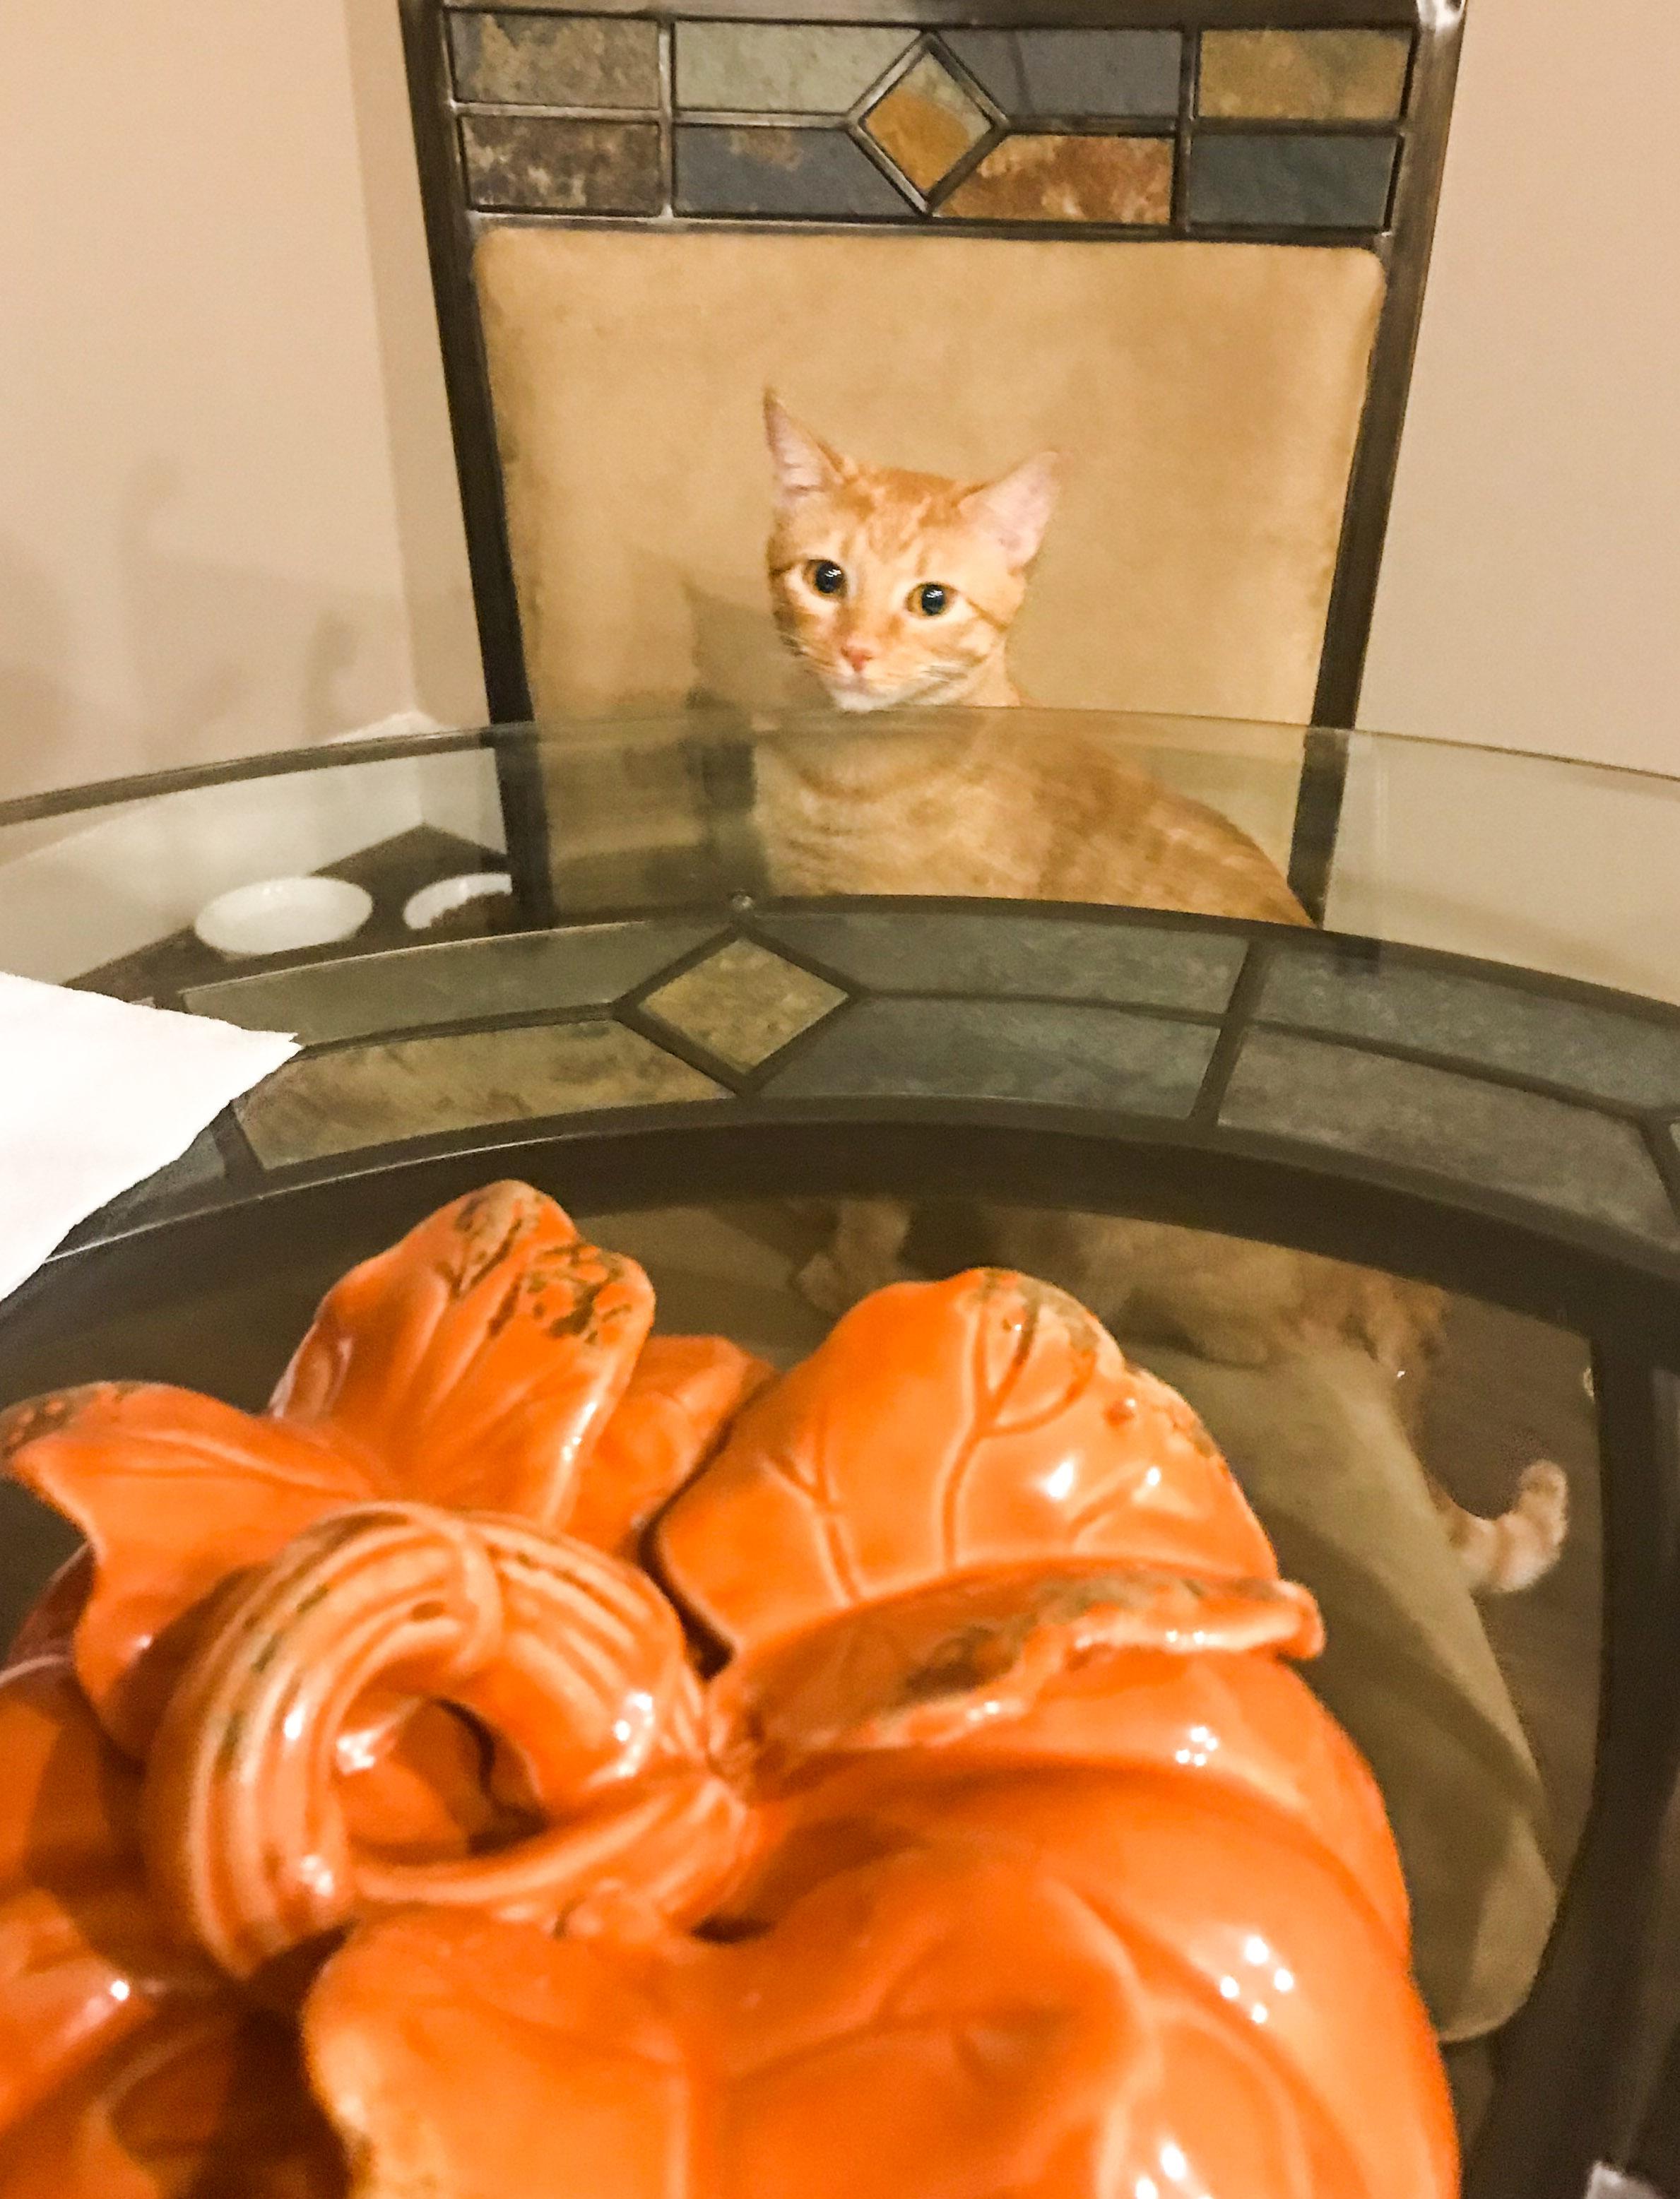 Marmalade at the table